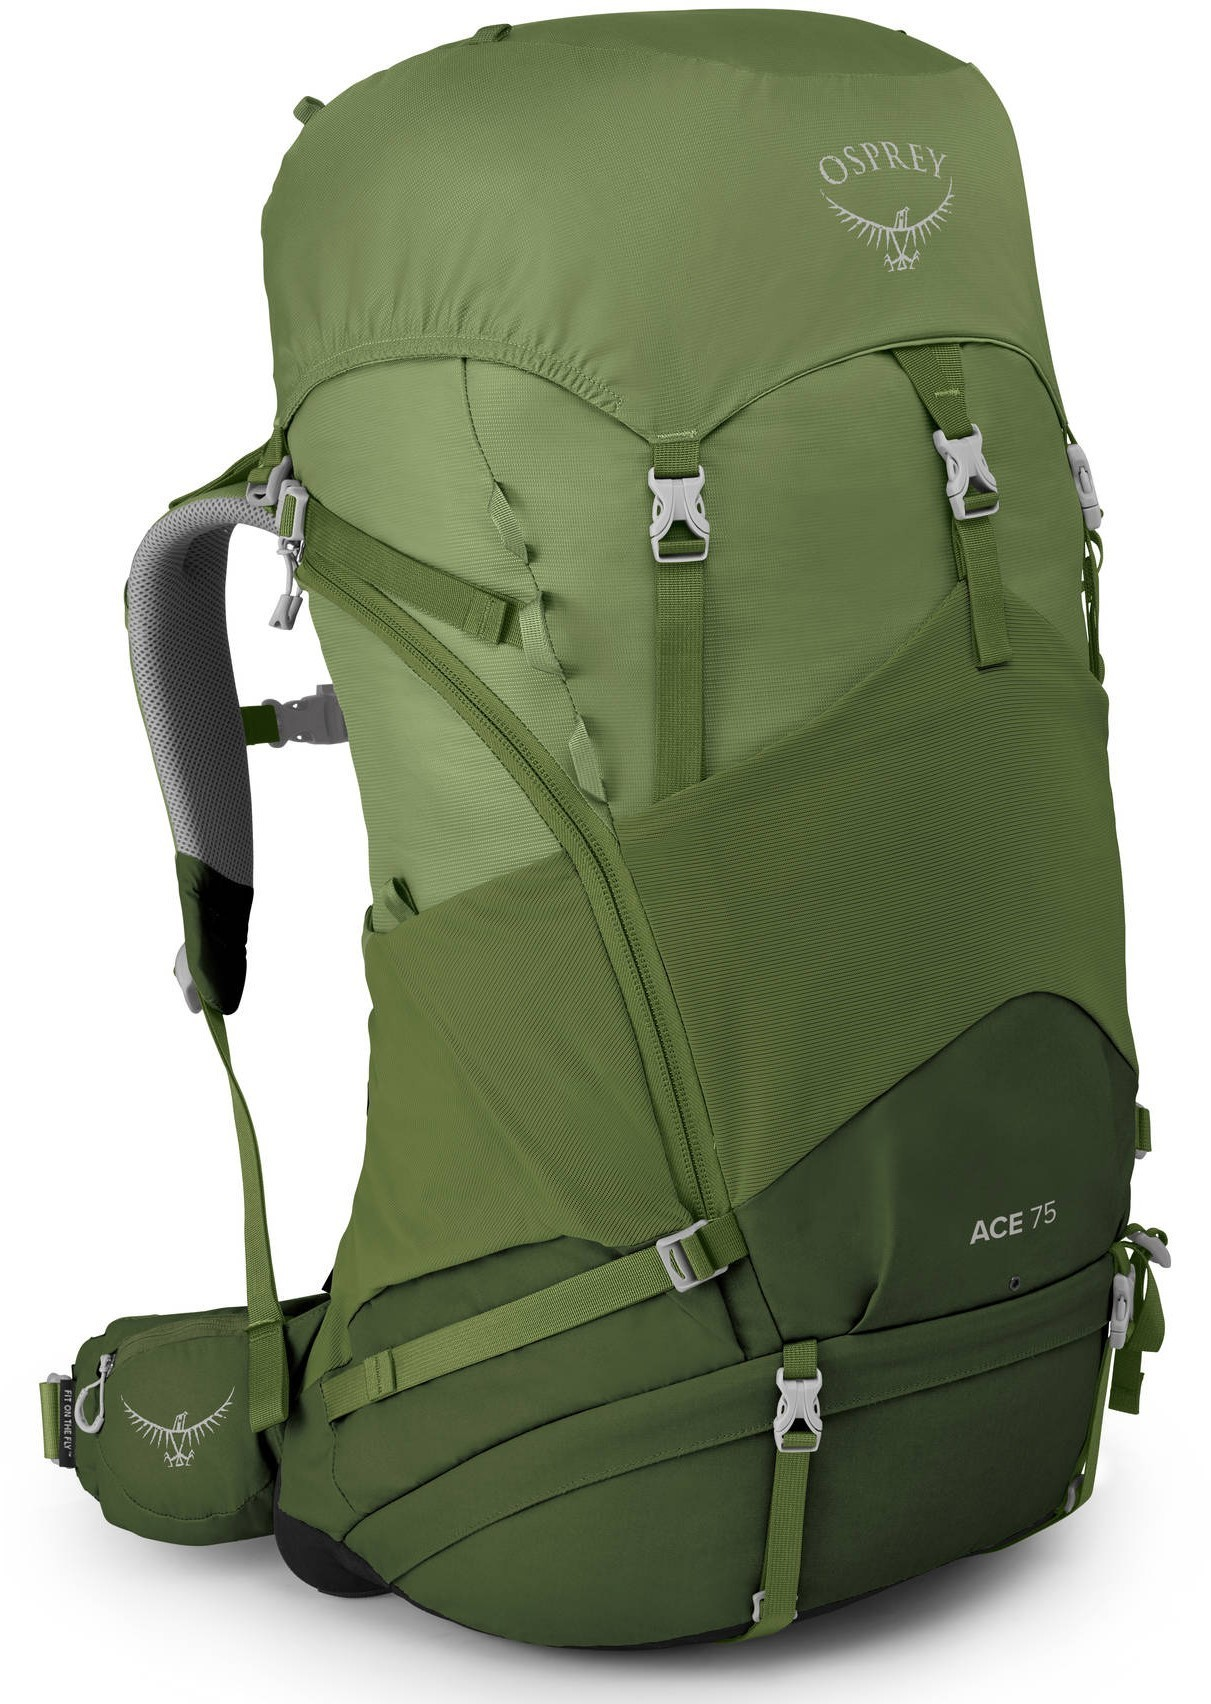 Ace Рюкзак Osprey Ace 75 Venture Green Ace_75_S20_Side_Venture_Green_web.jpg